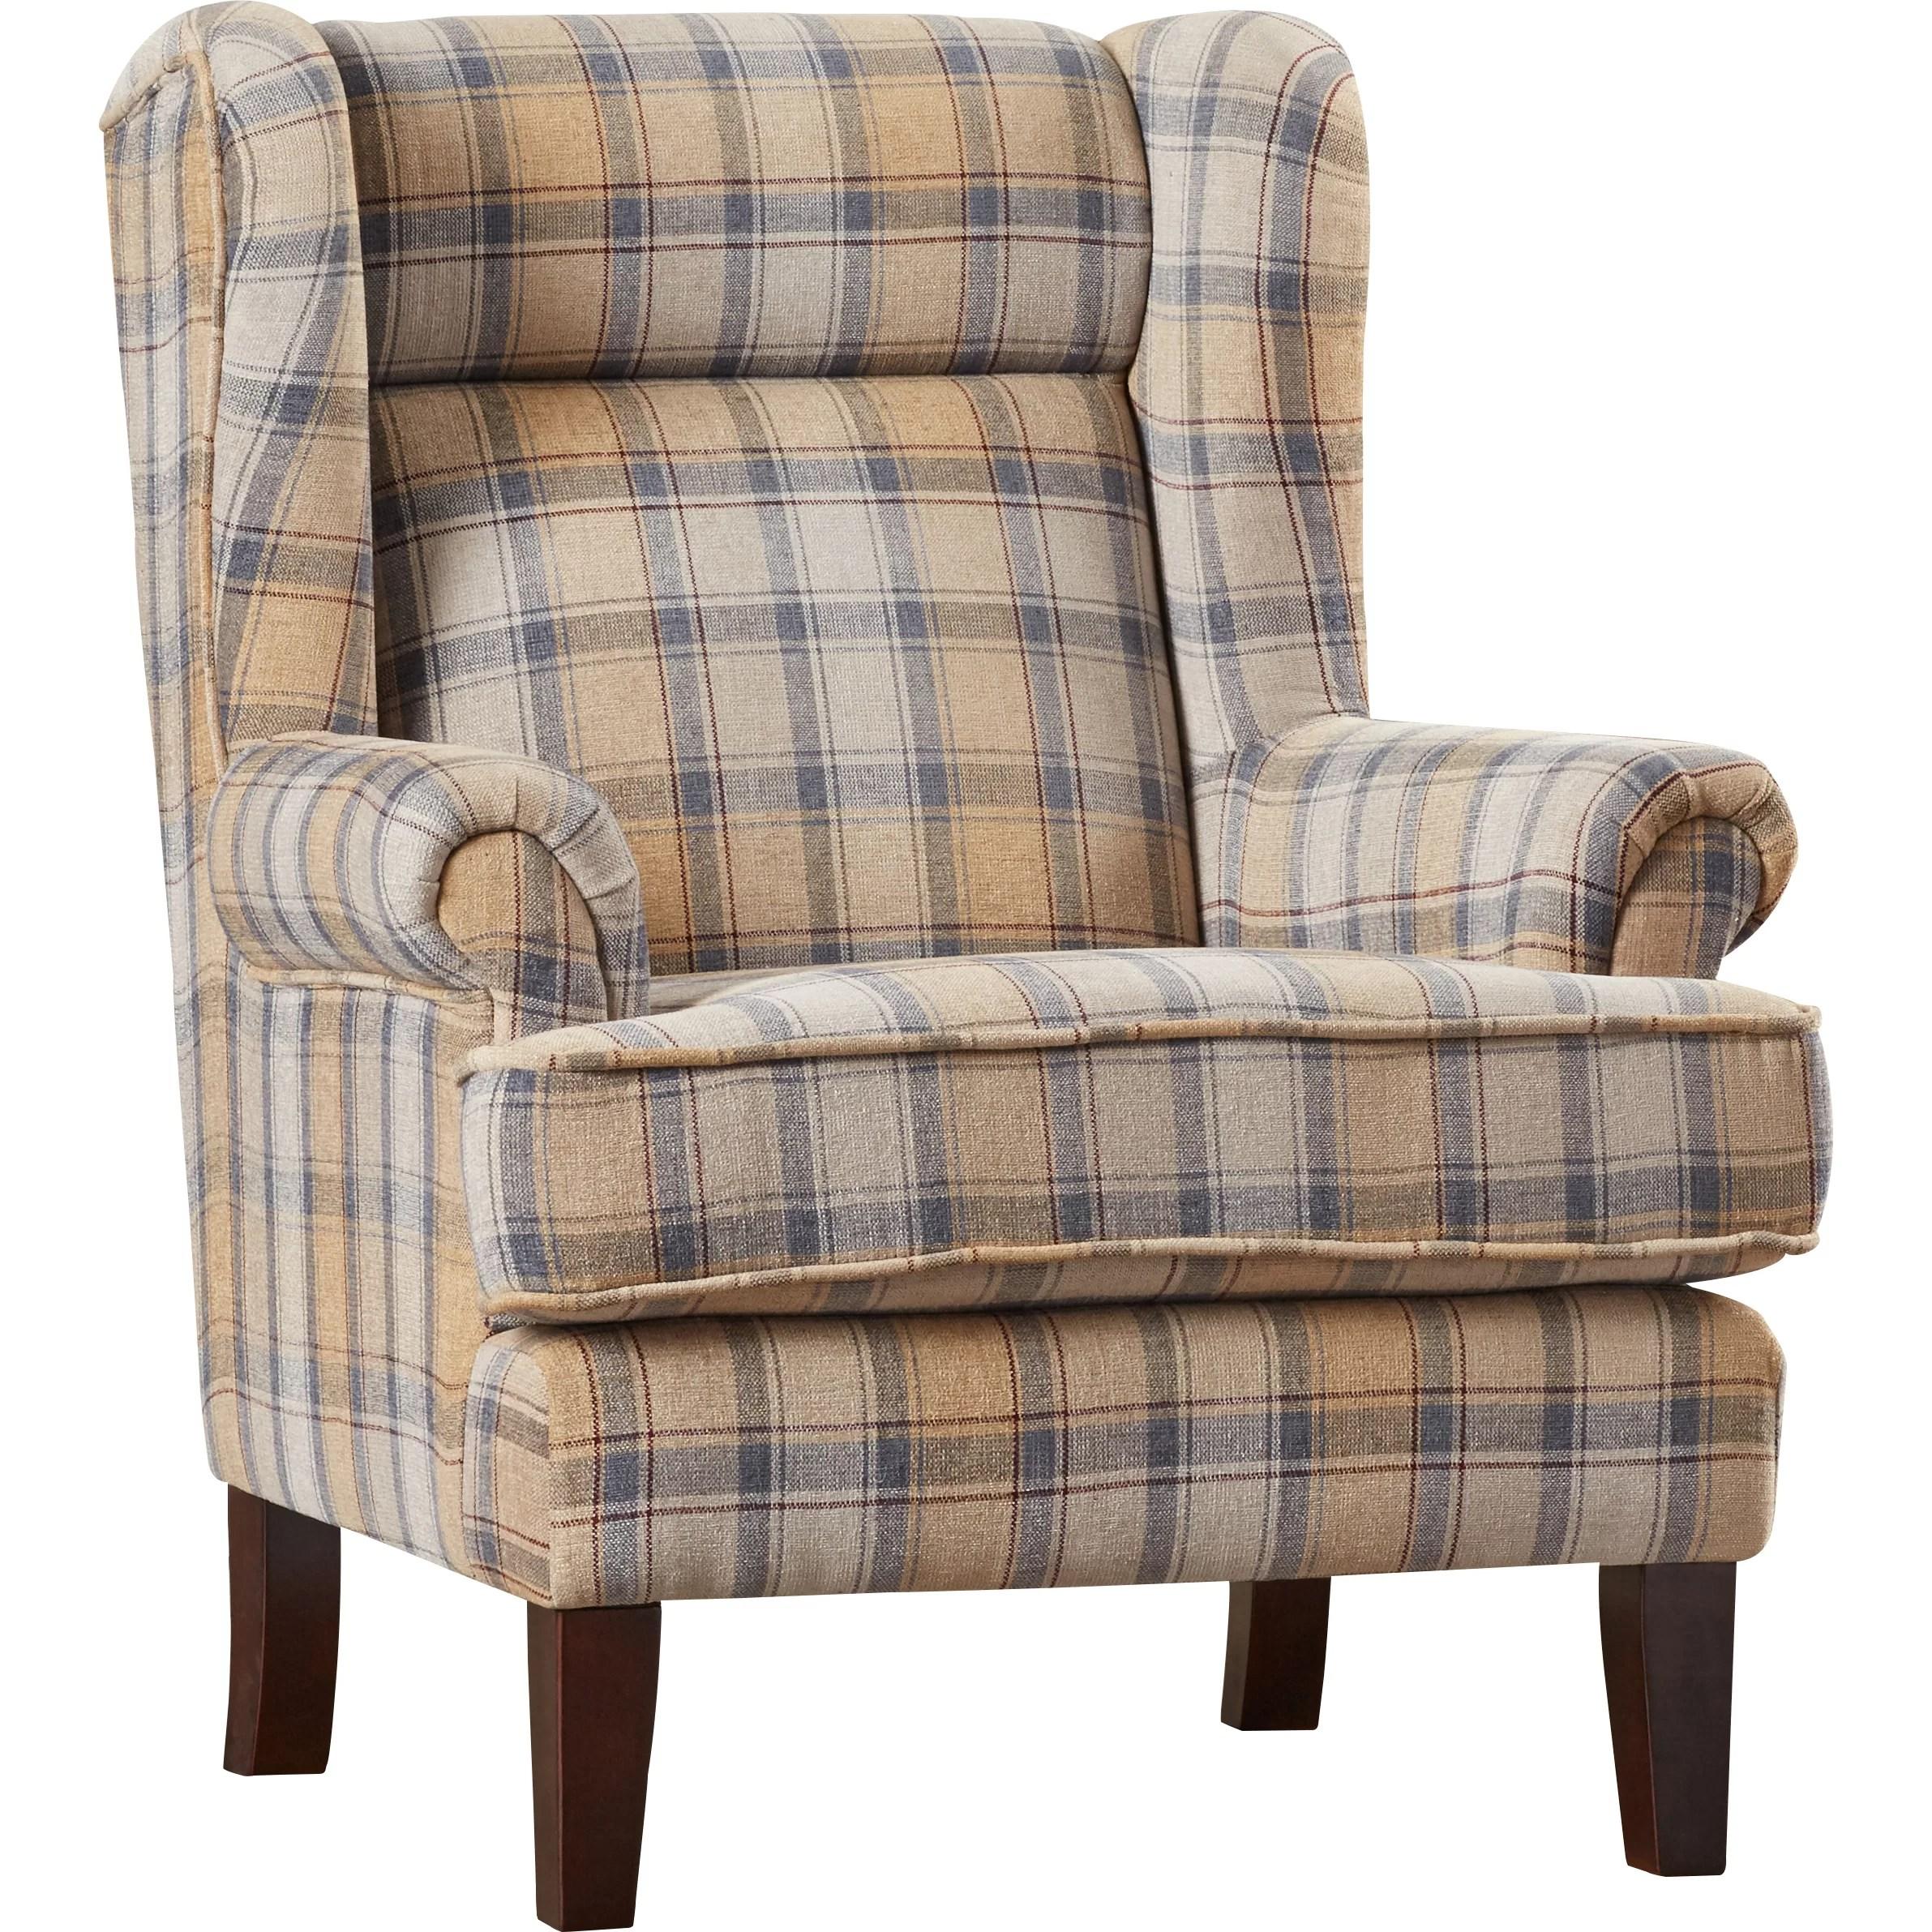 Darby Home Co Finley Plaid Print Wingback Chair  Wayfair